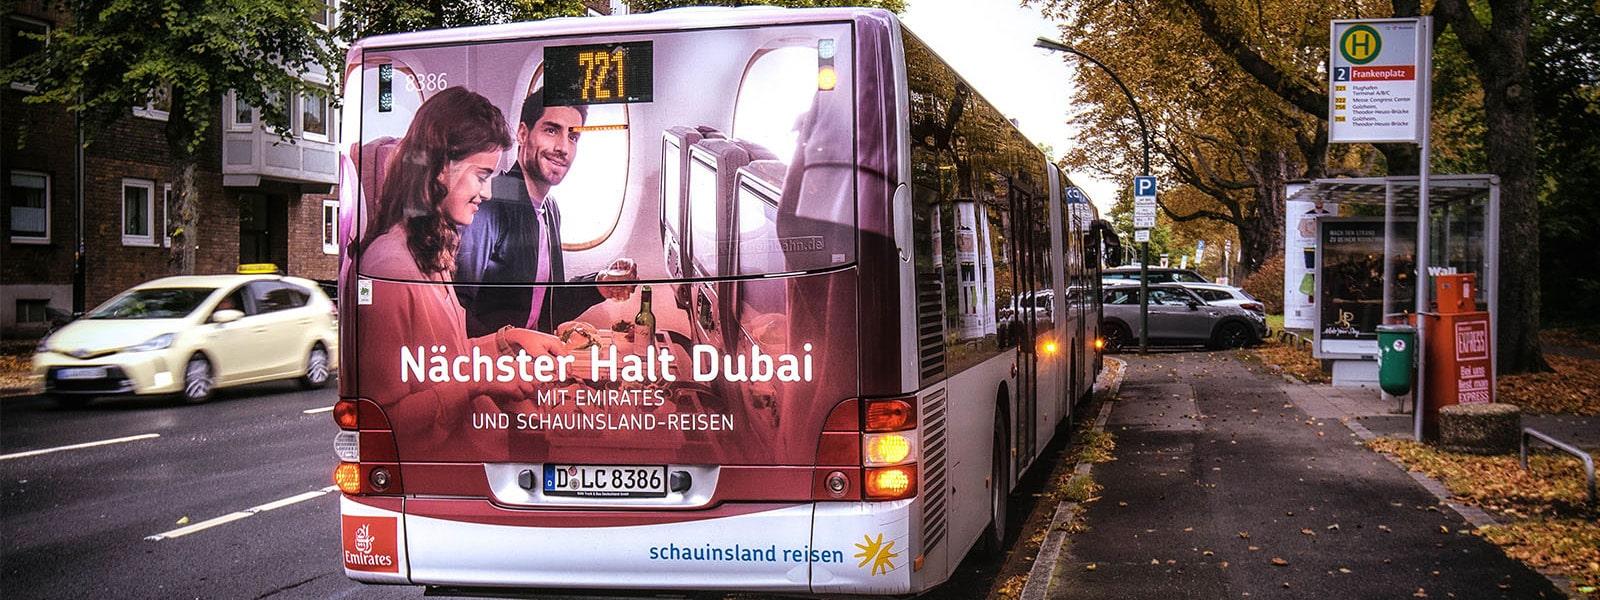 Leverkusen-Verkehrsmittelwerbung-Bus-Heckflaechenwerbung